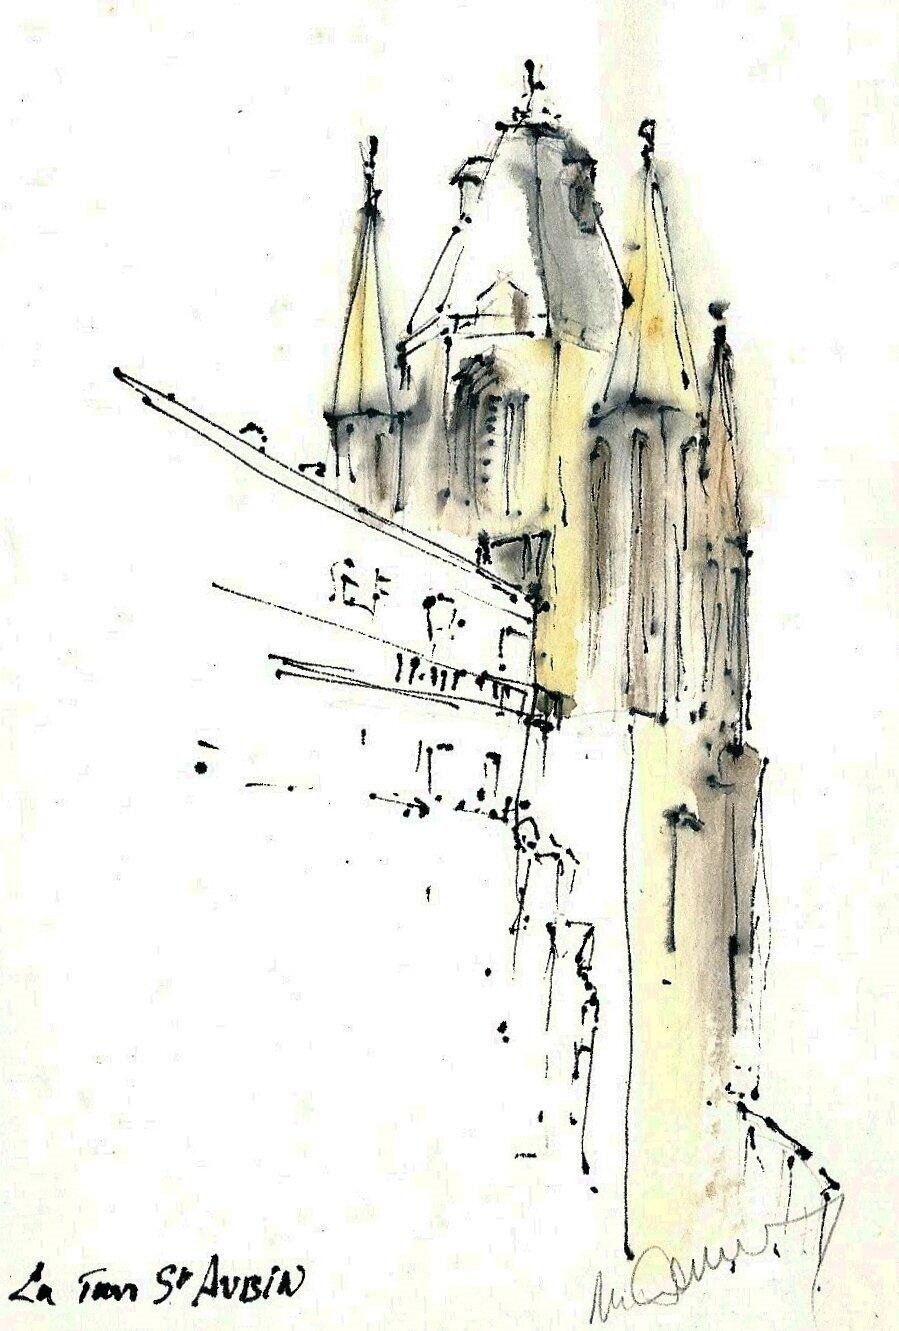 3 Tour St Aubin